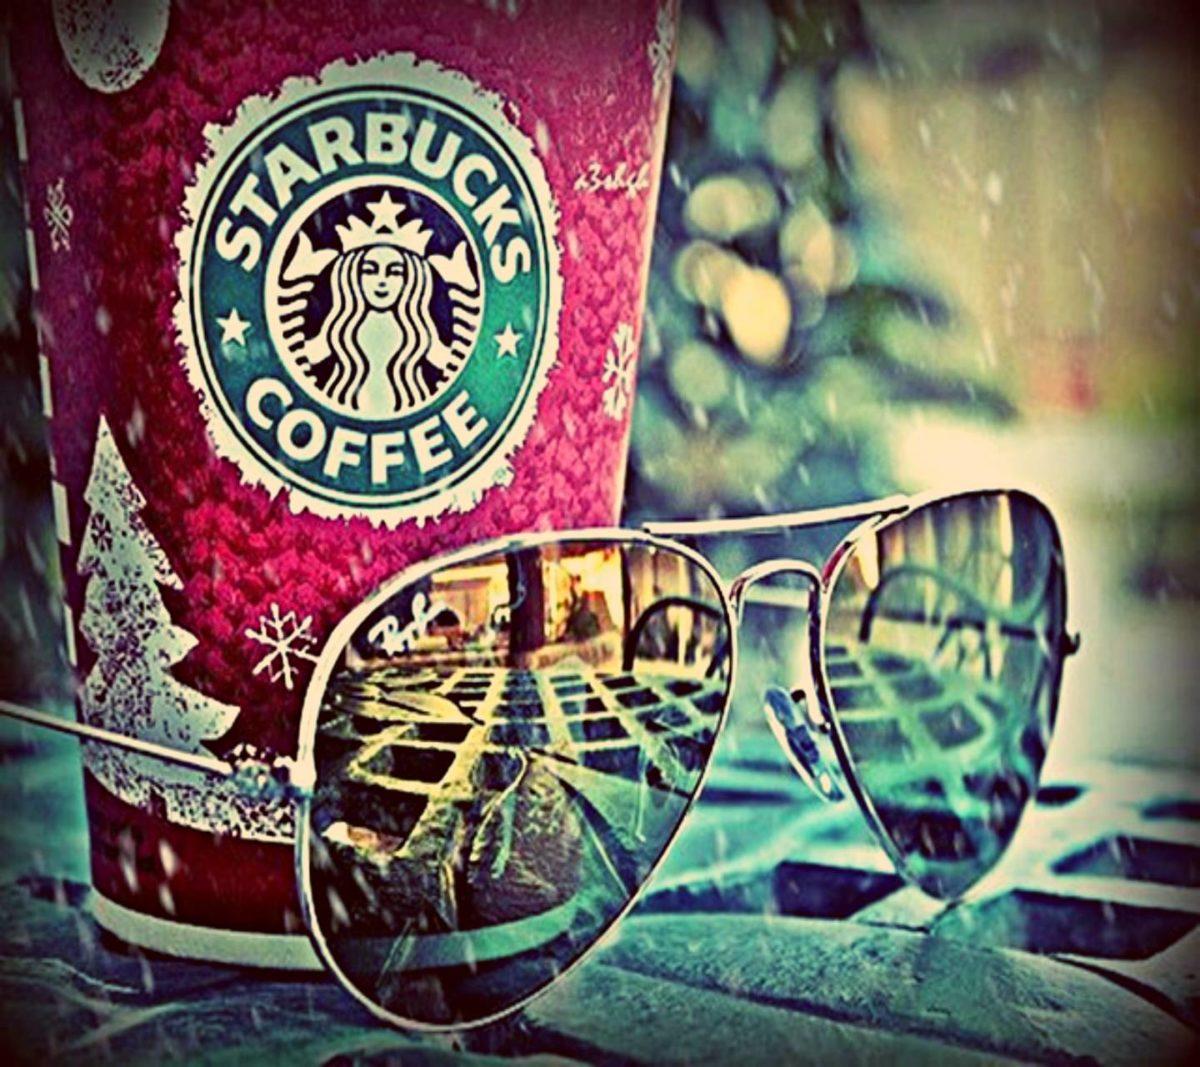 starbucks coffee wallpapers iphone | walljpeg.